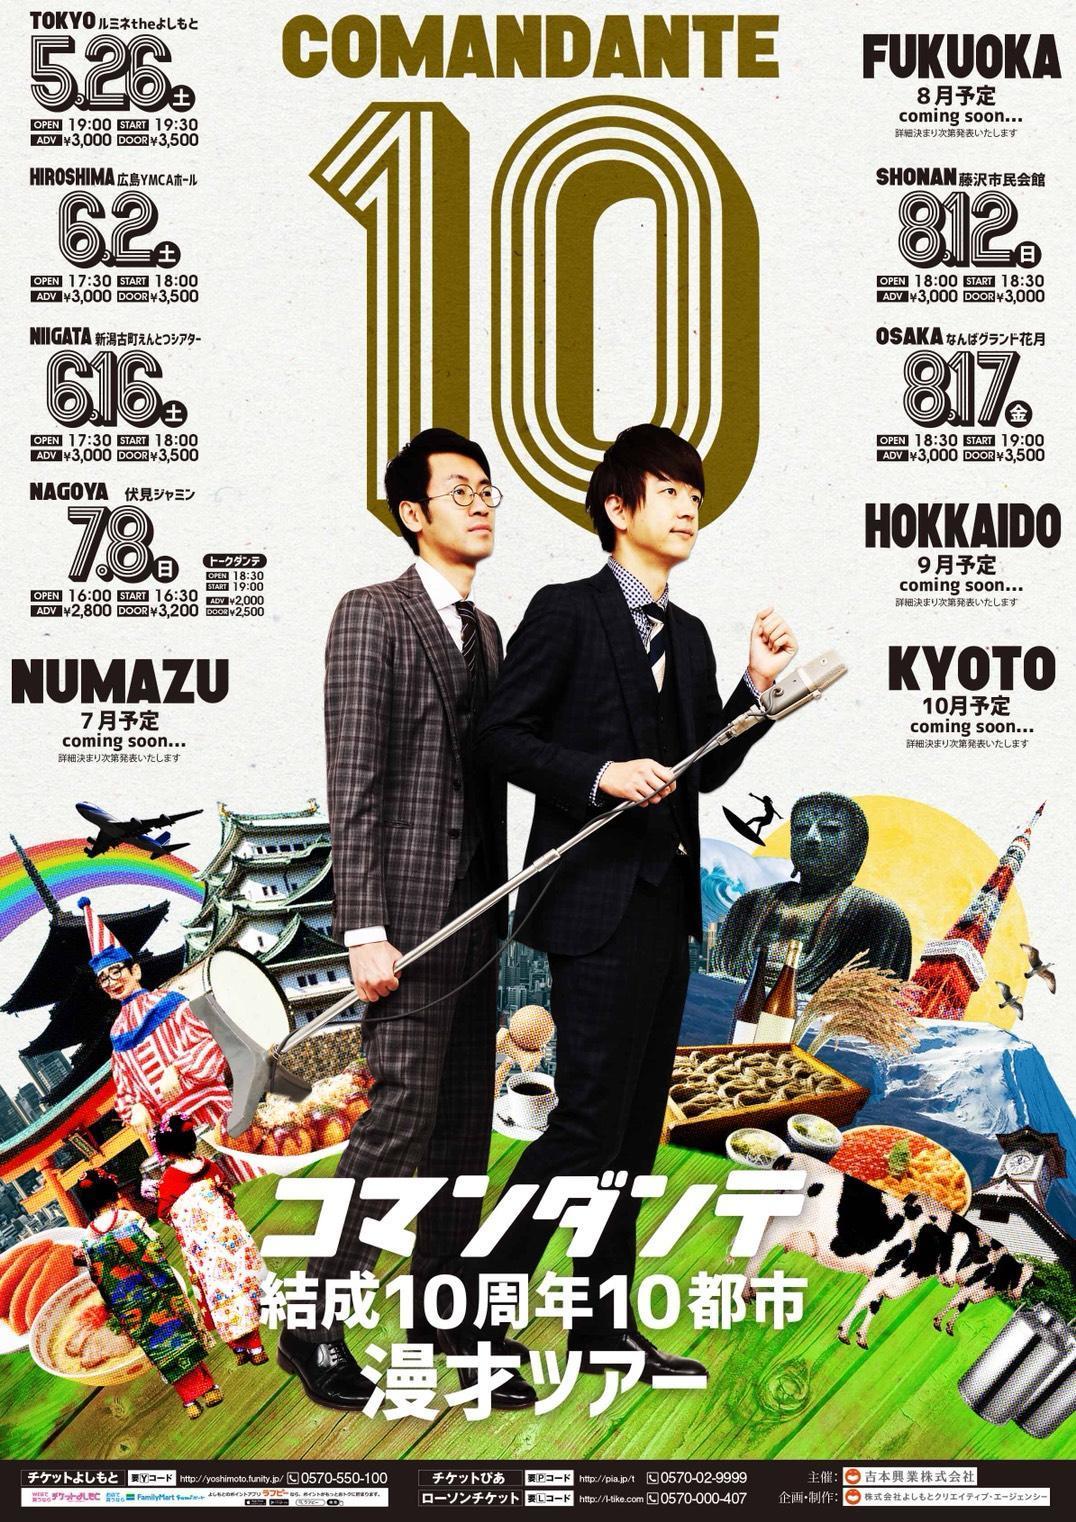 http://news.yoshimoto.co.jp/20180330094530-2fba4f1a6828d7e48944493db2a3248af6701073.jpg